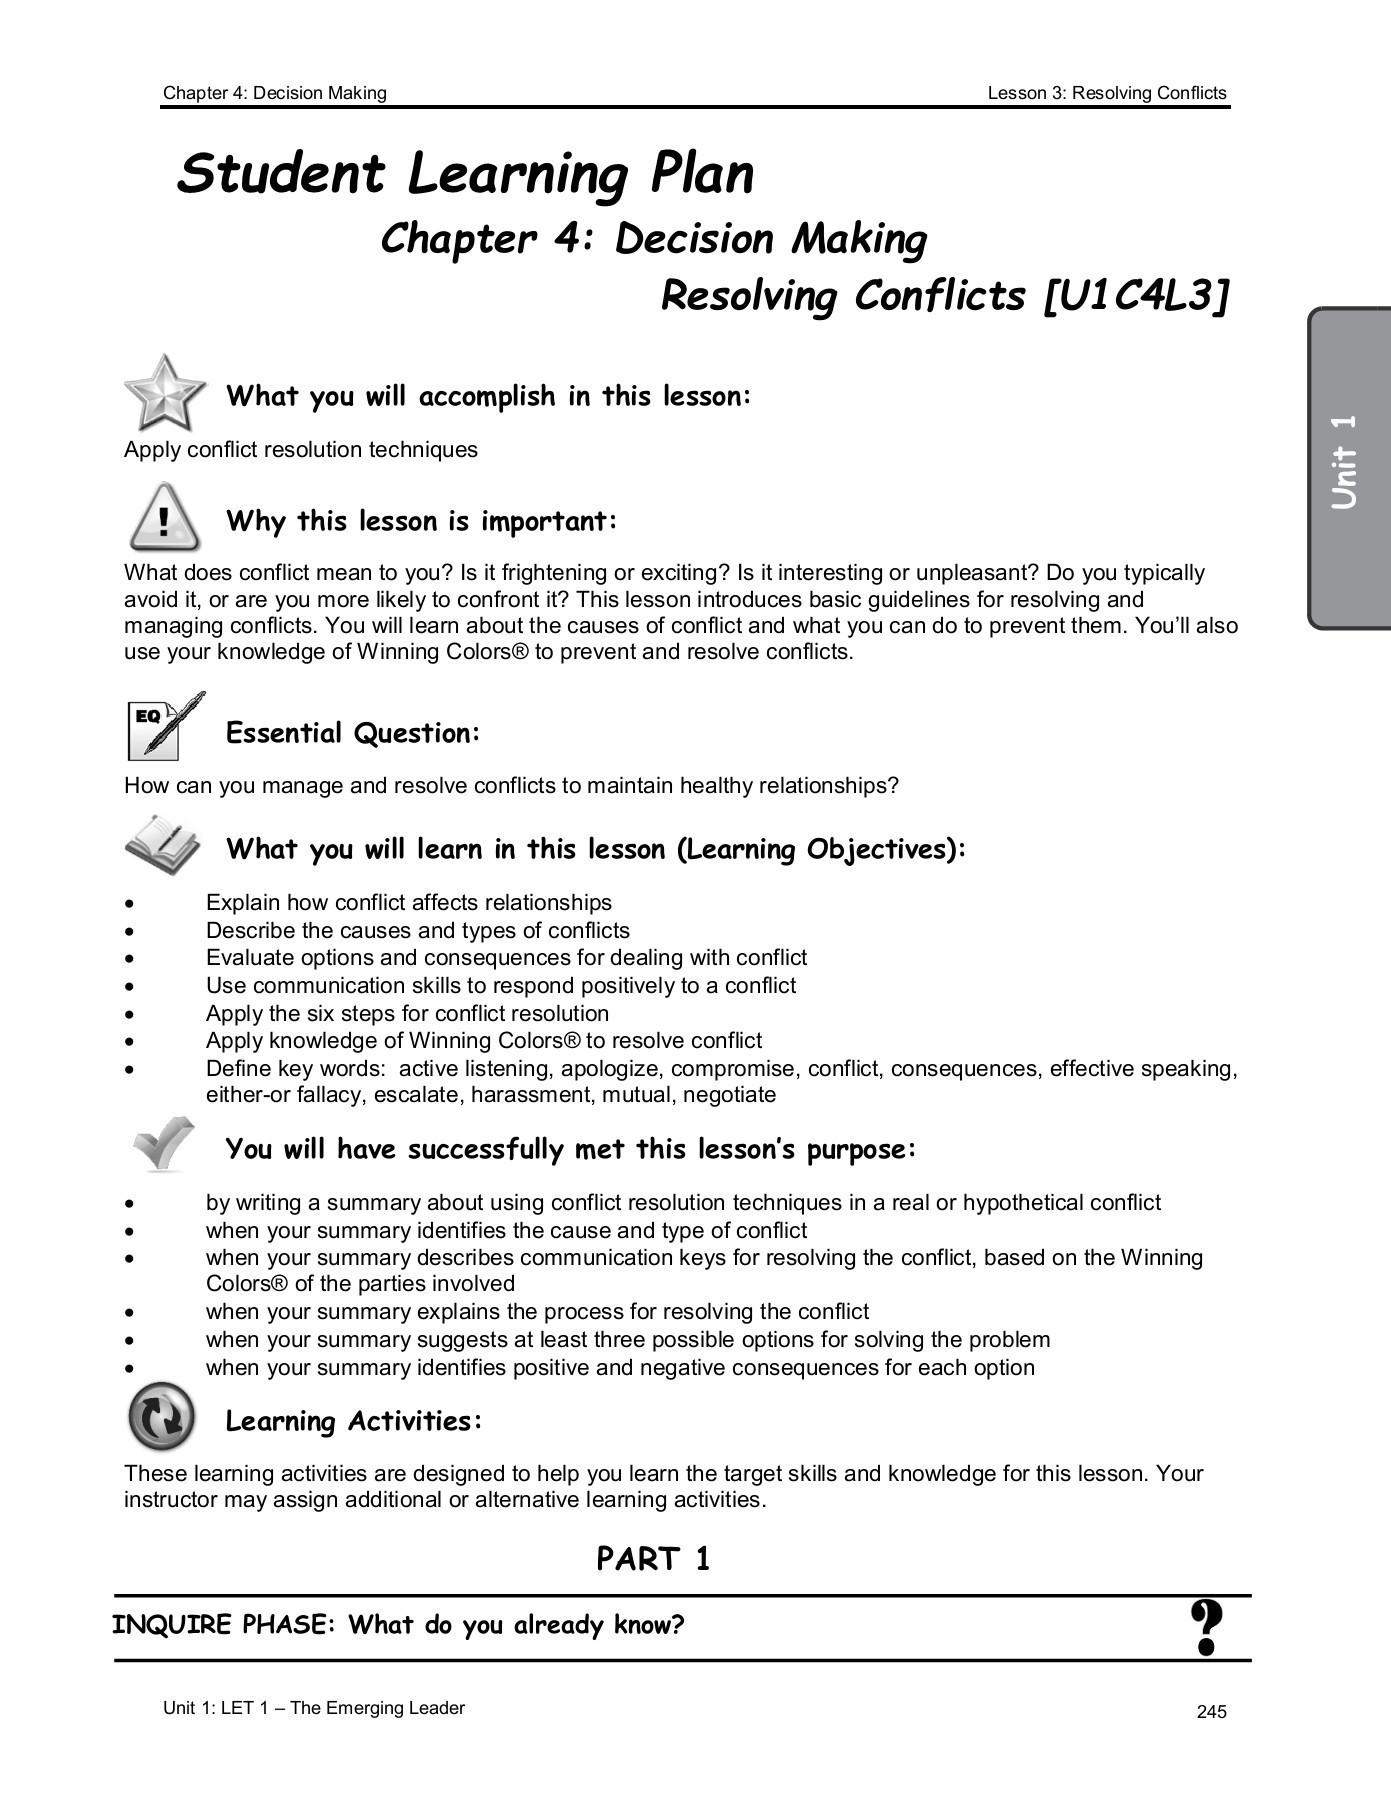 Types Of Conflict Worksheet Unit 1 Cadet Notebook Flip Book Pages 251 300